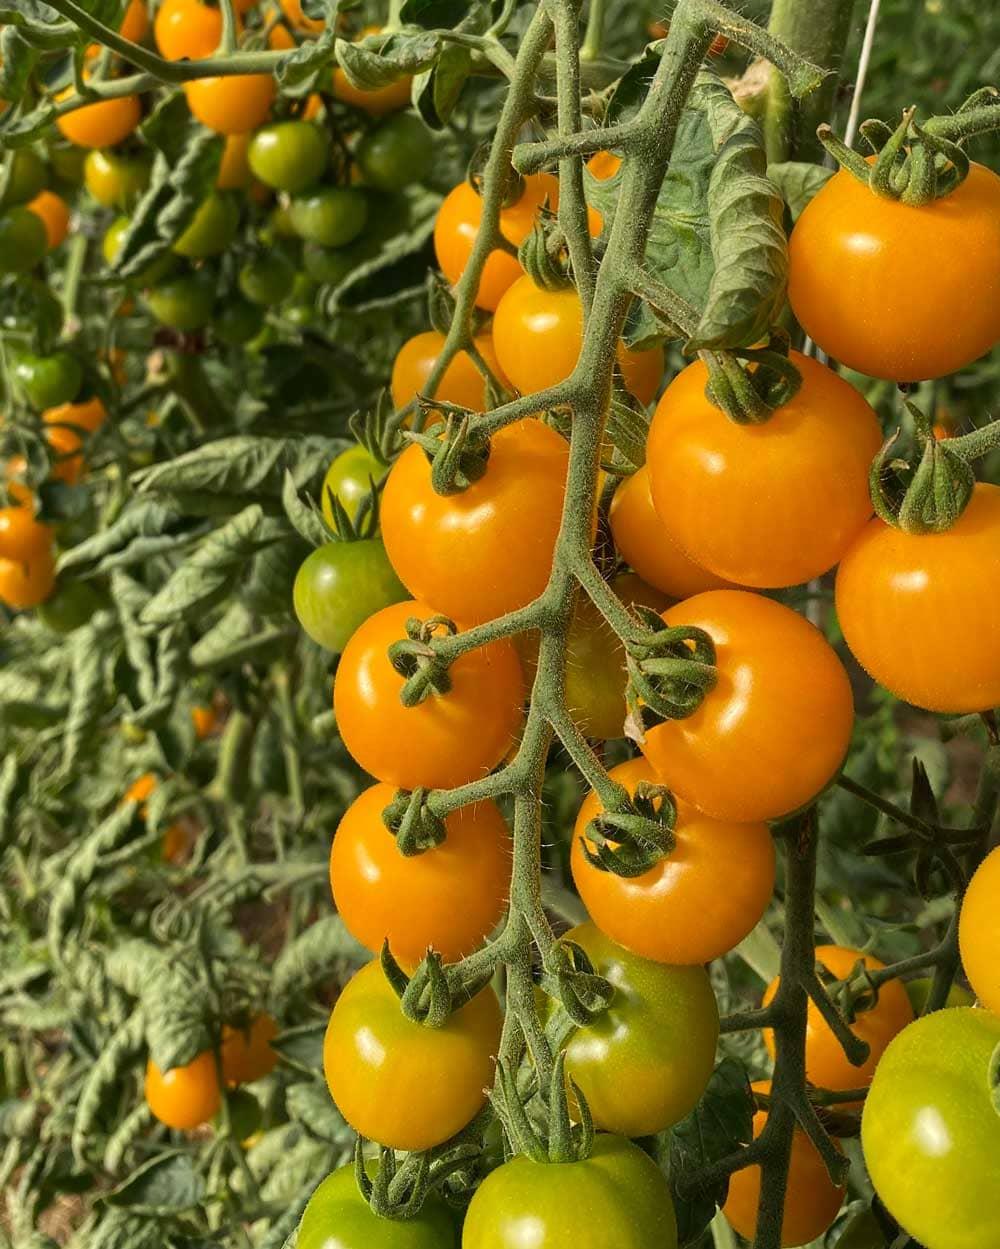 Gula tomater i klase.